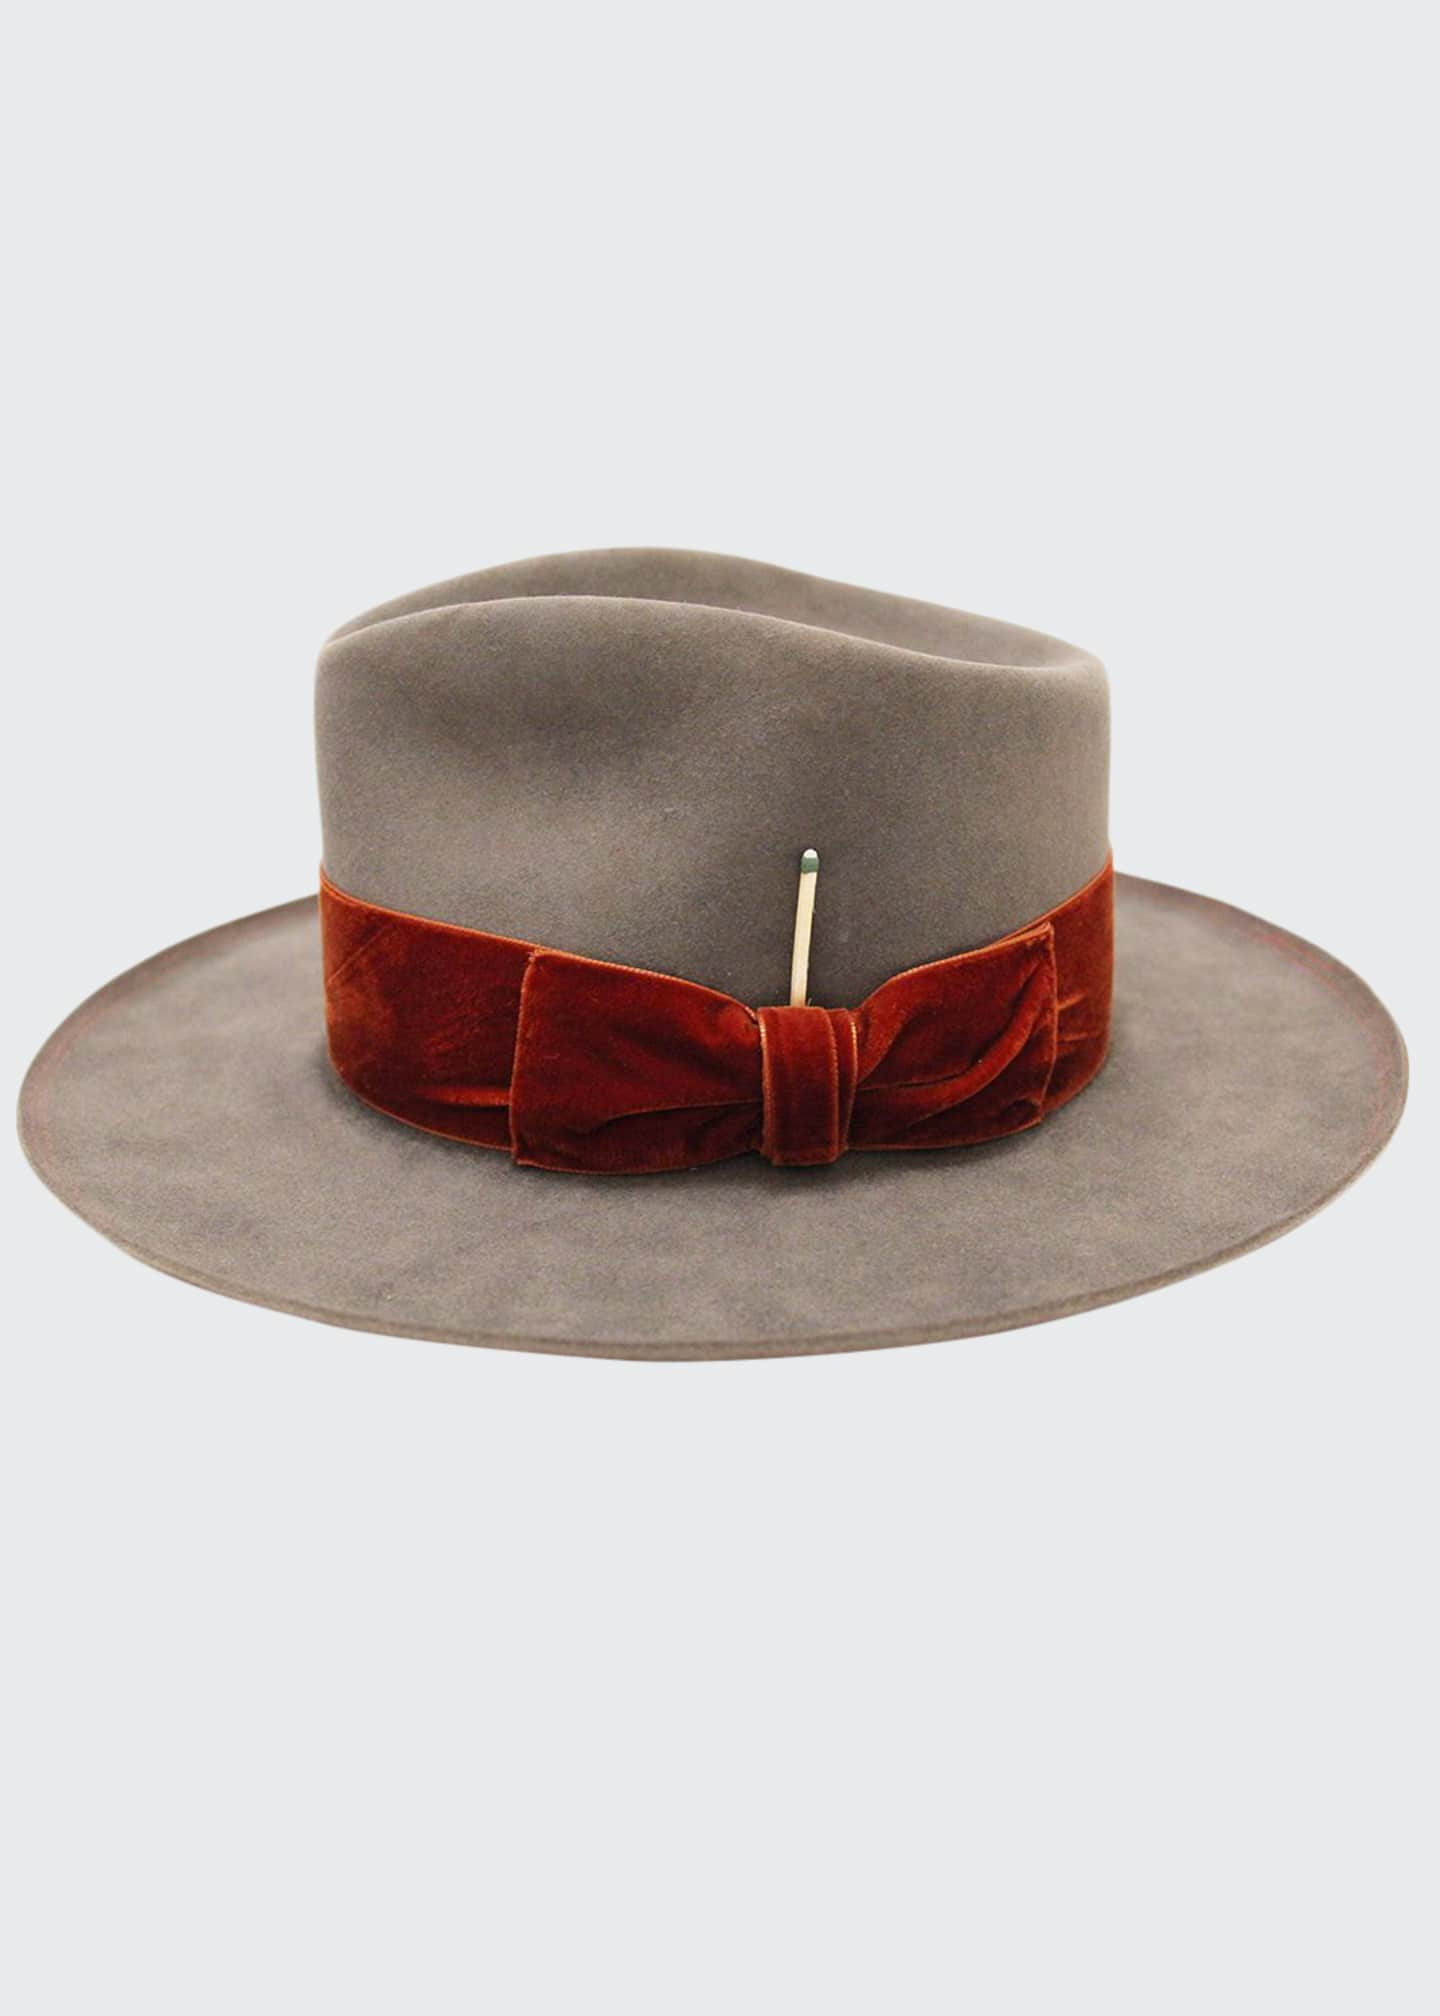 Nick Fouquet Publix Beaver Felt Fedora Hat